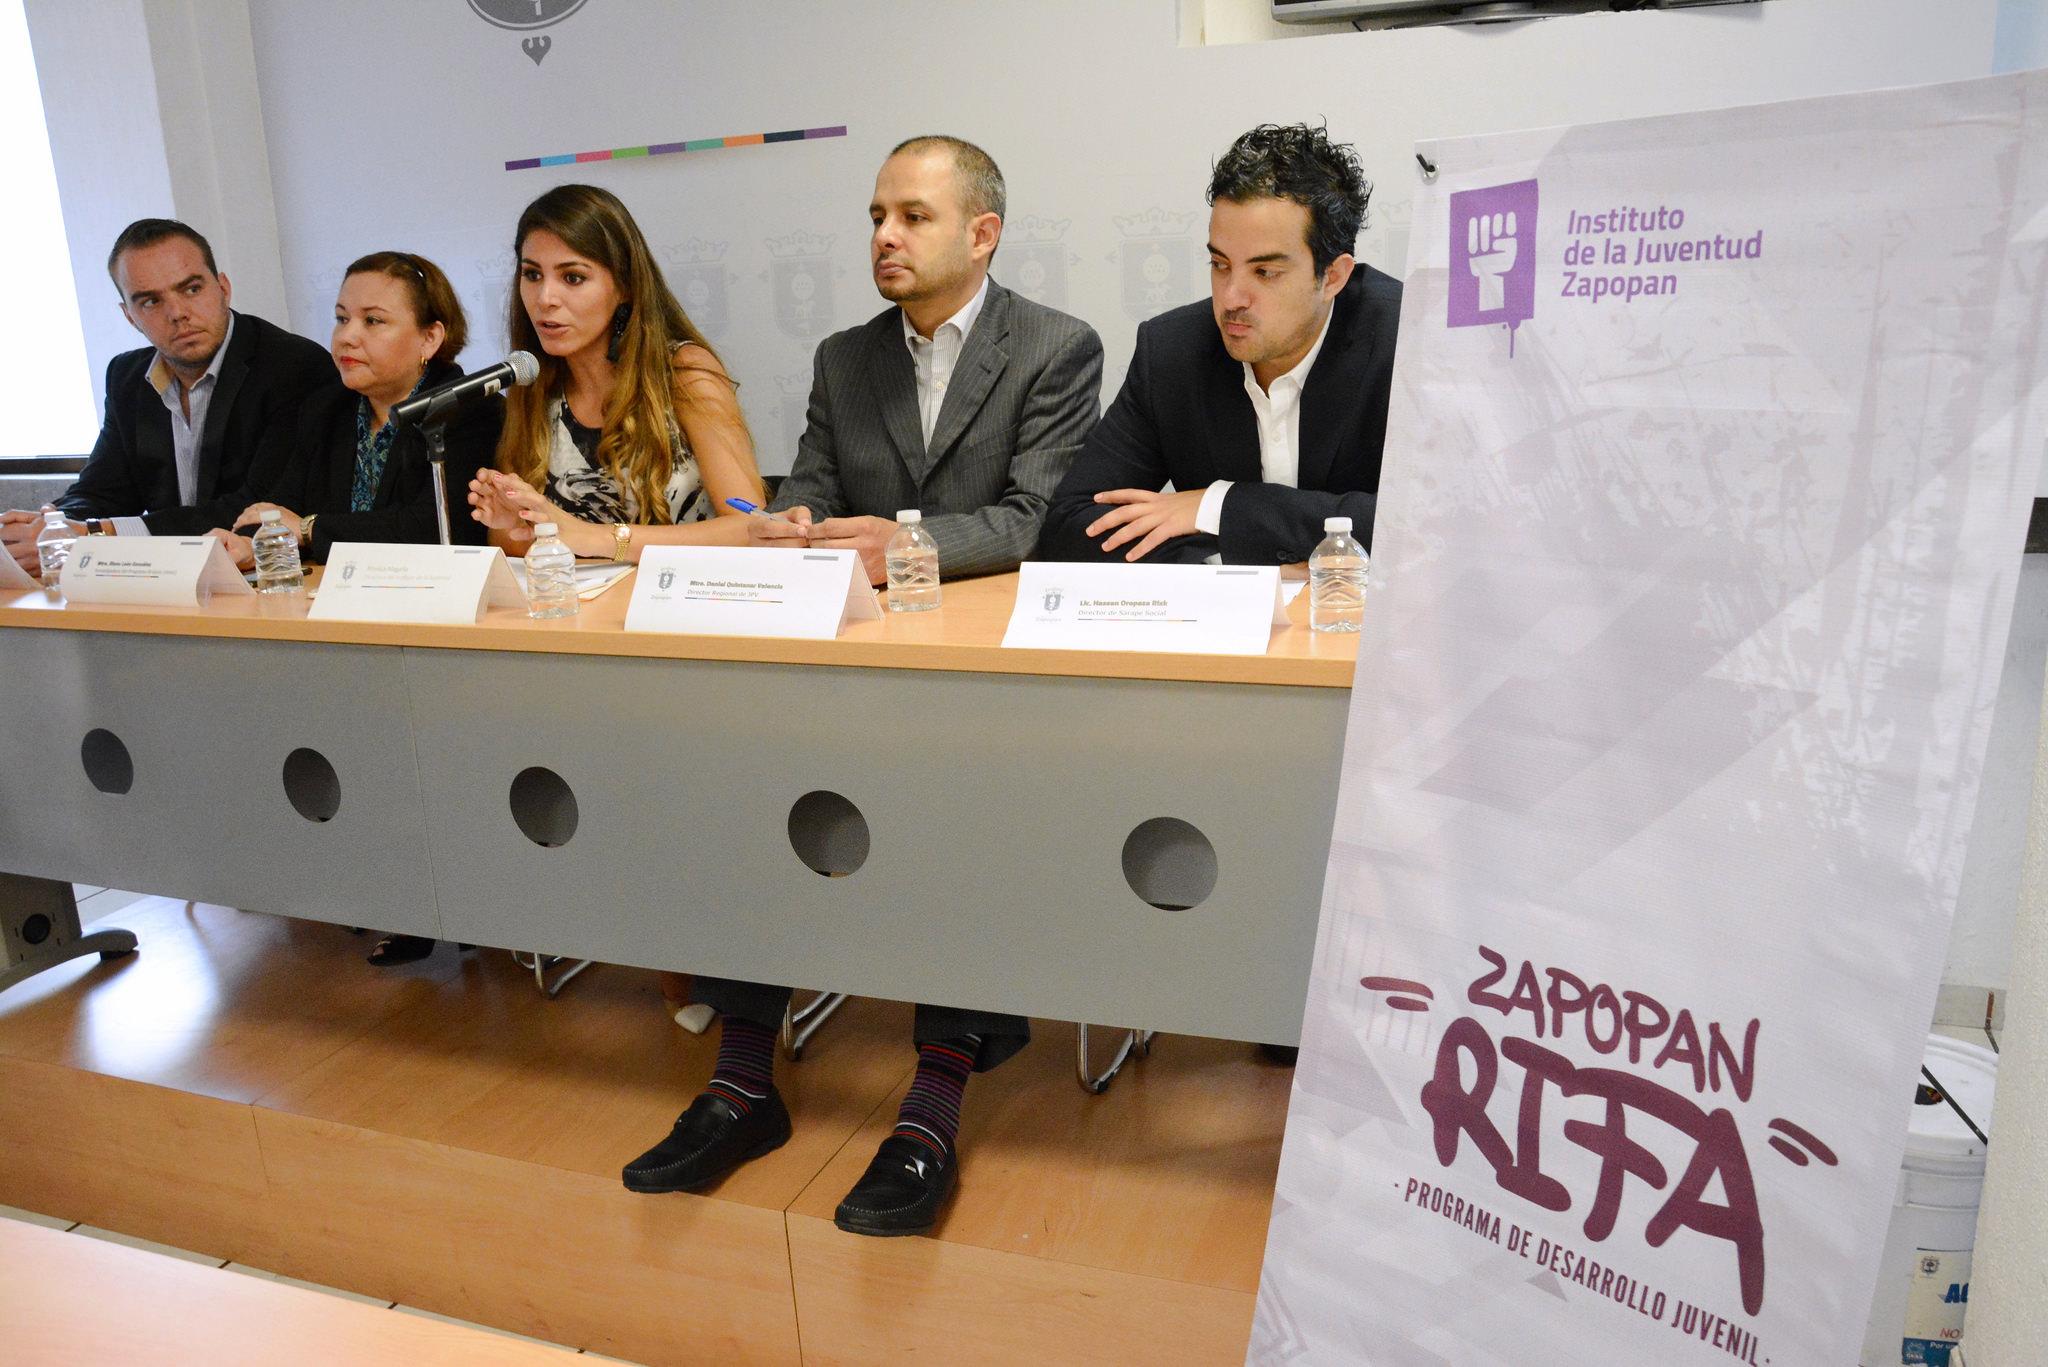 Presentación del programa Zapopan RIFA